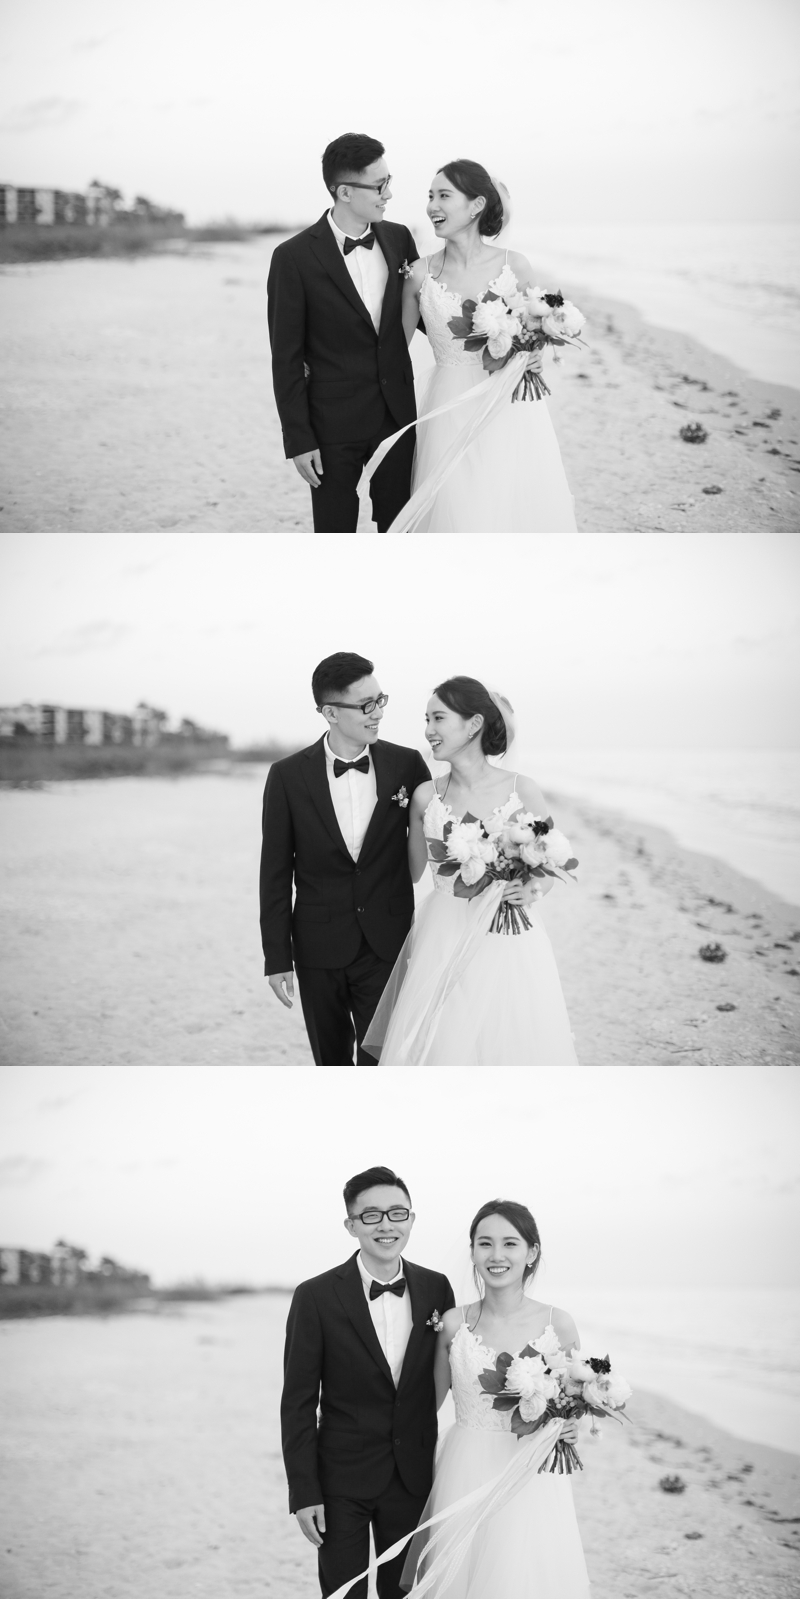 audreysnow-photography-casa-ybel-wedding_4548.jpg